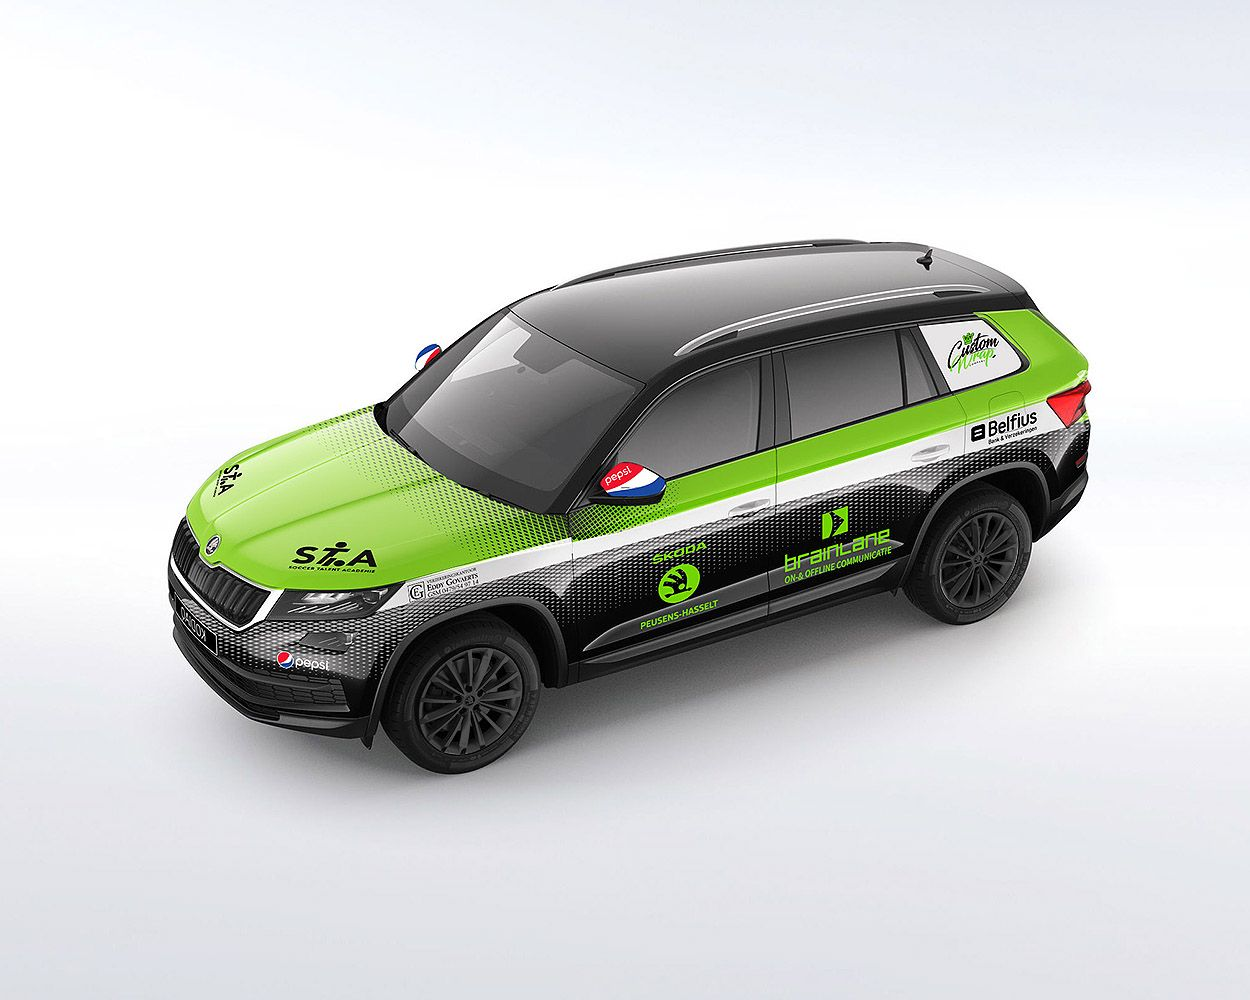 Concept Car Wrap Skoda Kodiaq For Aa Drink Soccer Arena